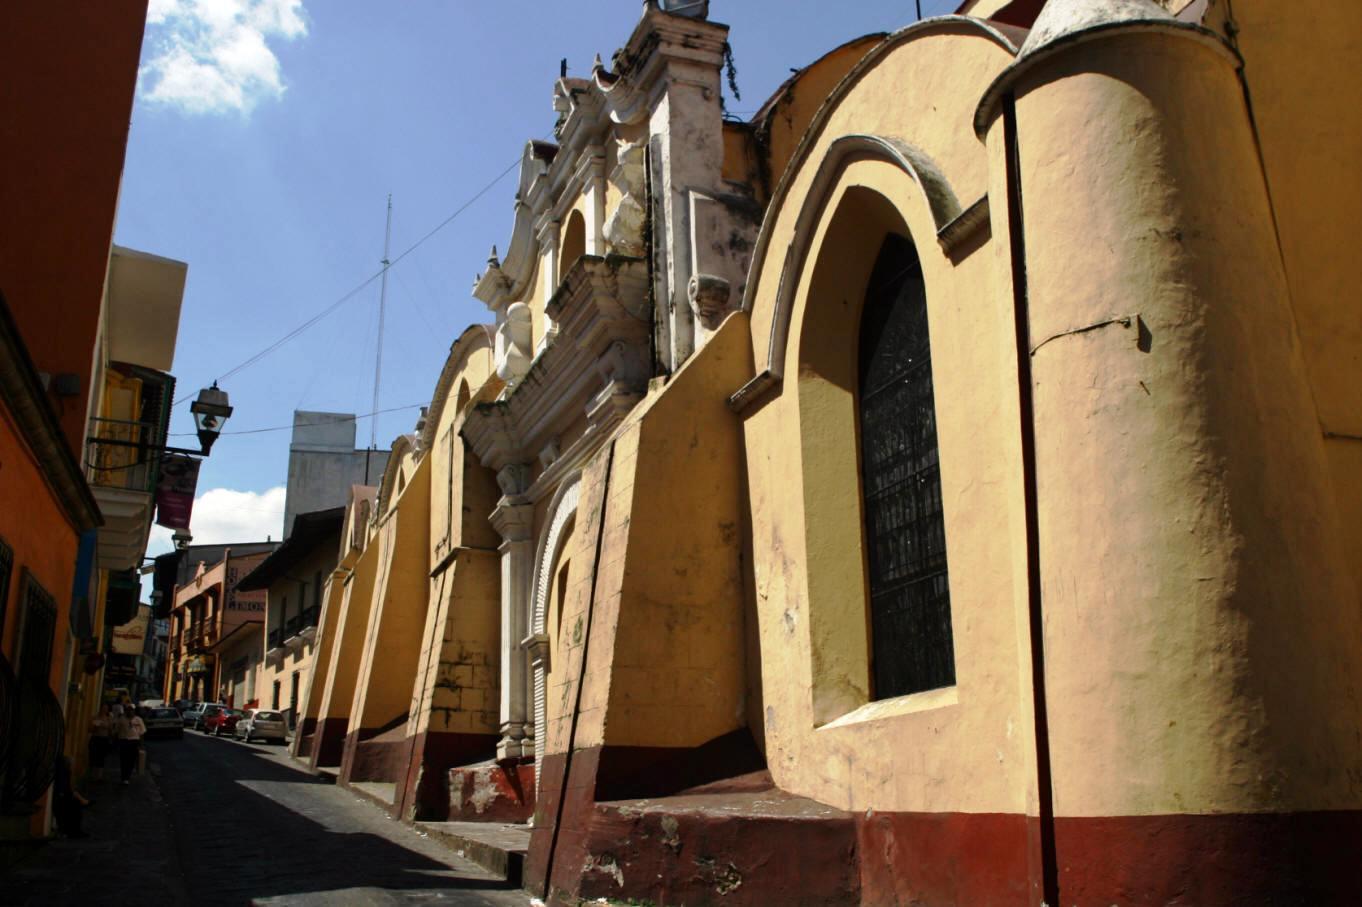 Xalapa Mexico Xalapa Veracruz Mexico by